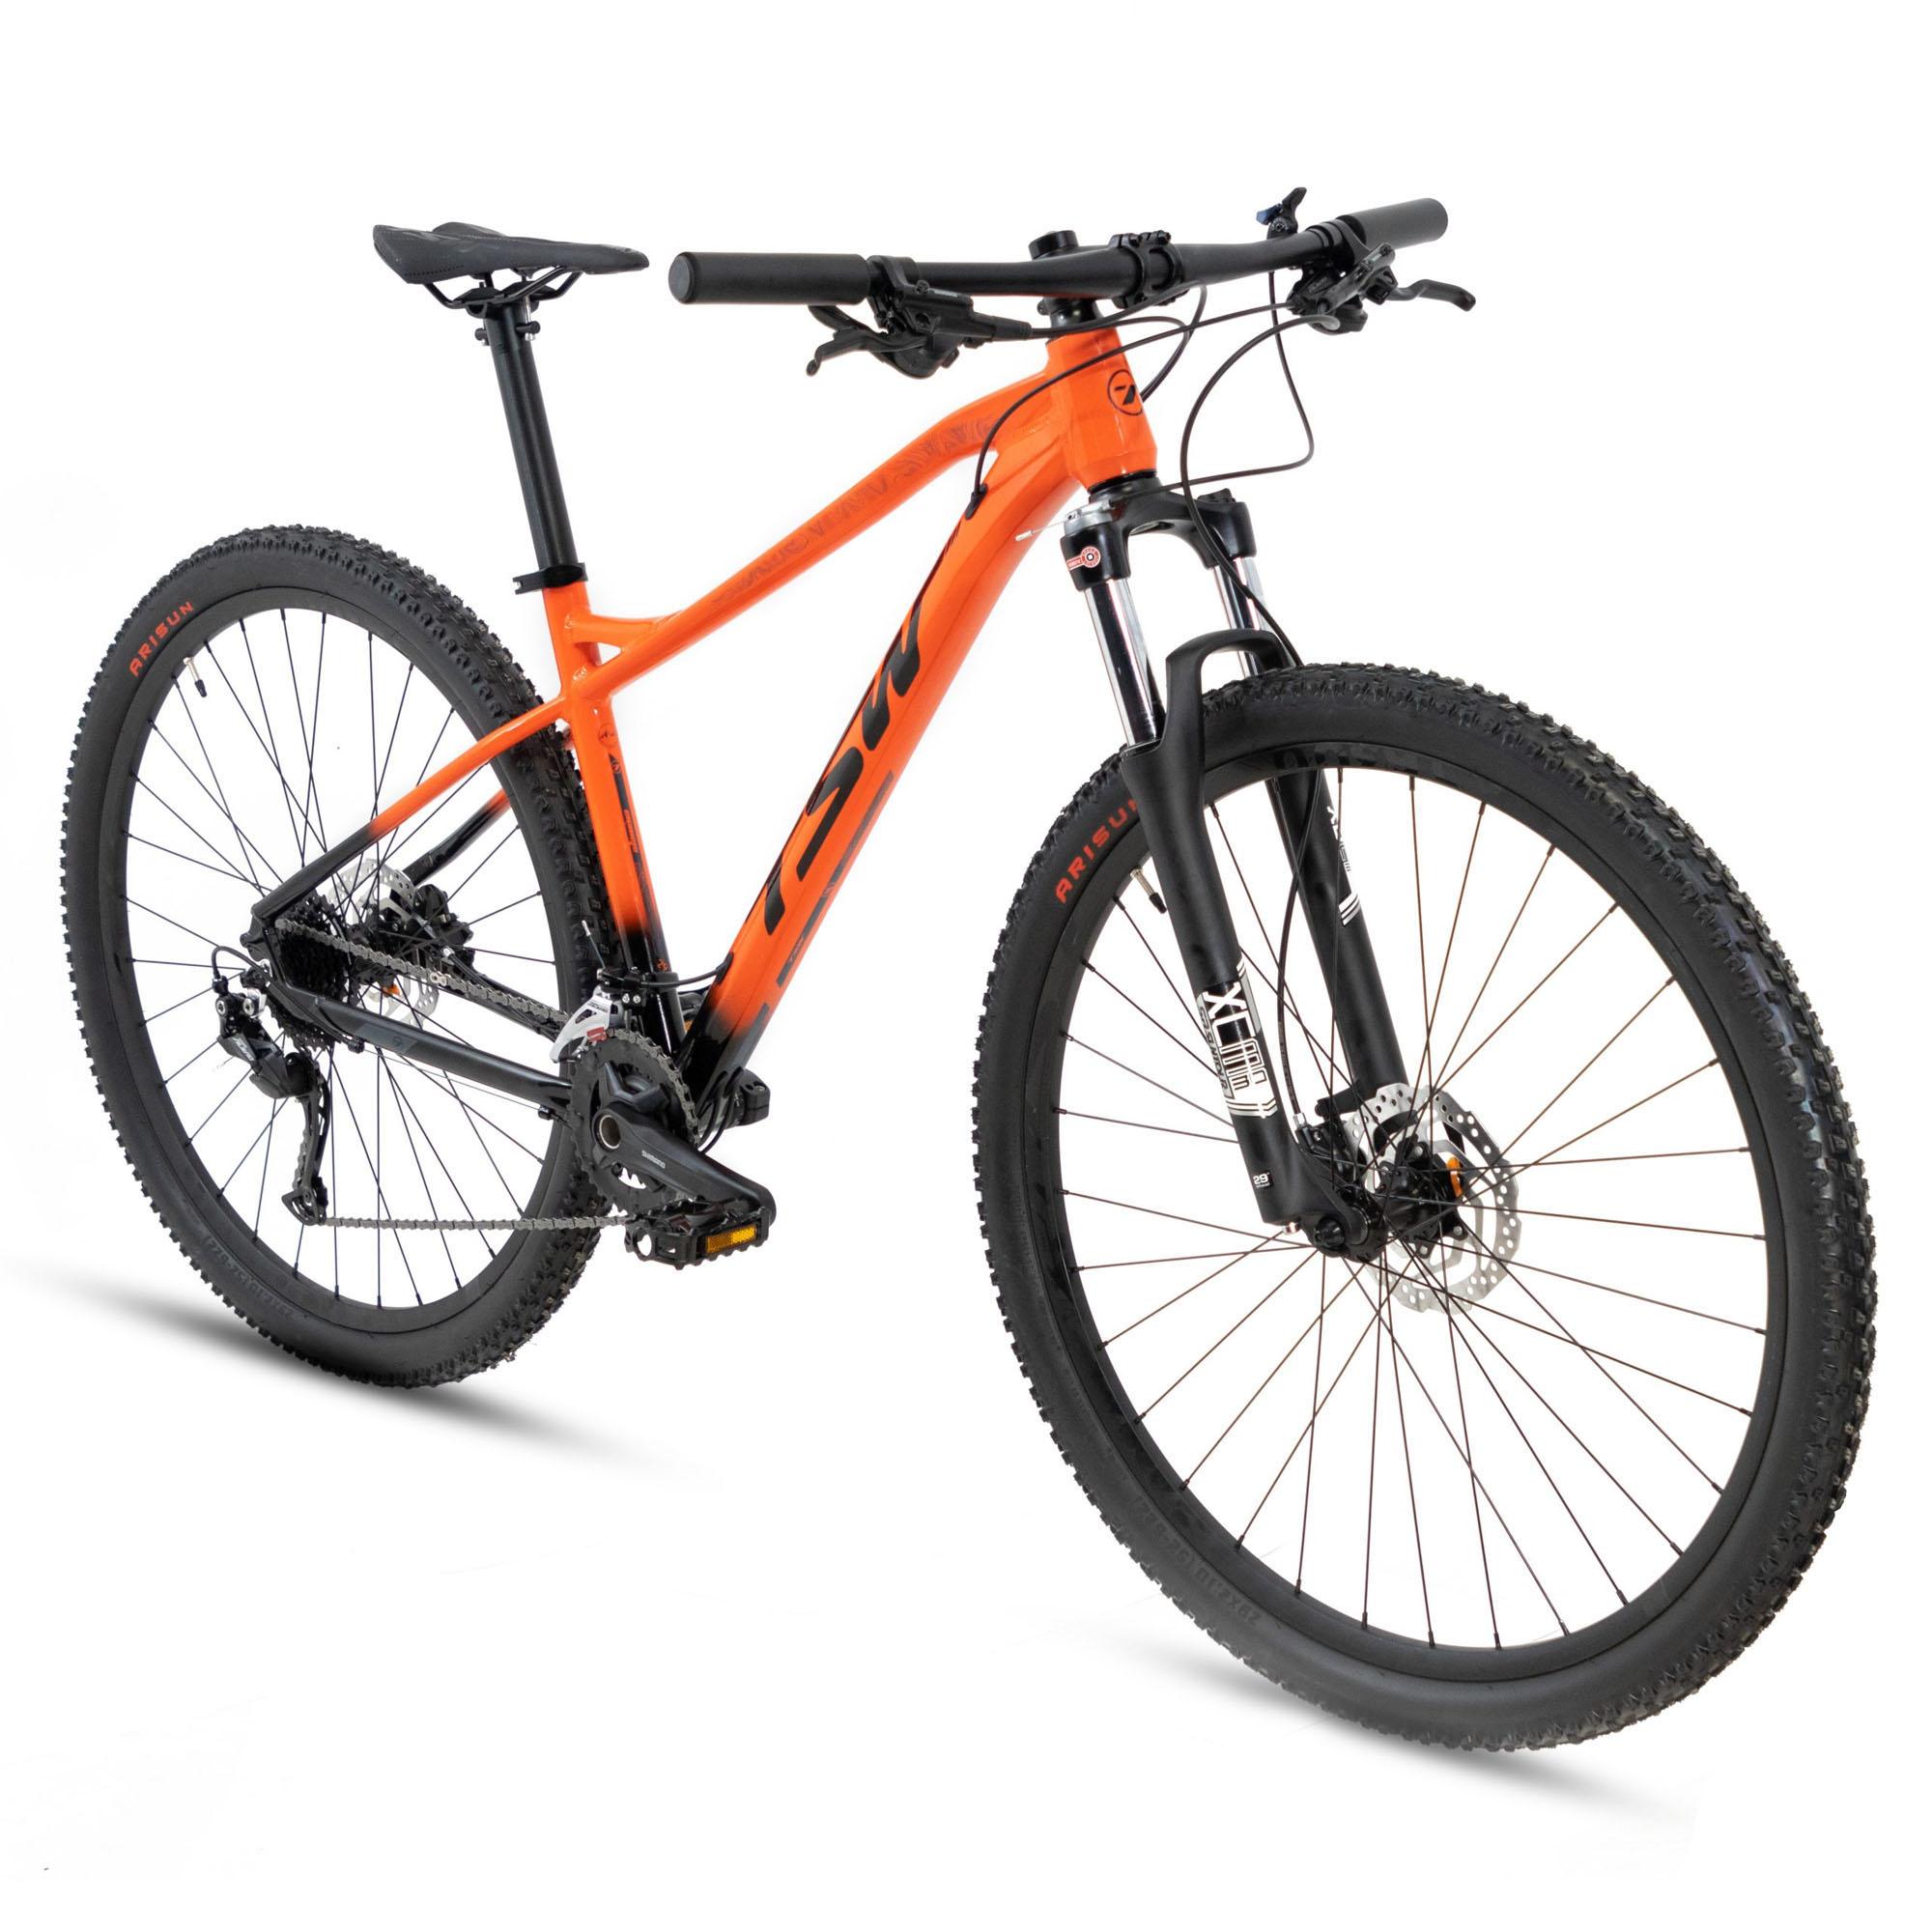 Bicicleta TSW STAMINA 2021/2022